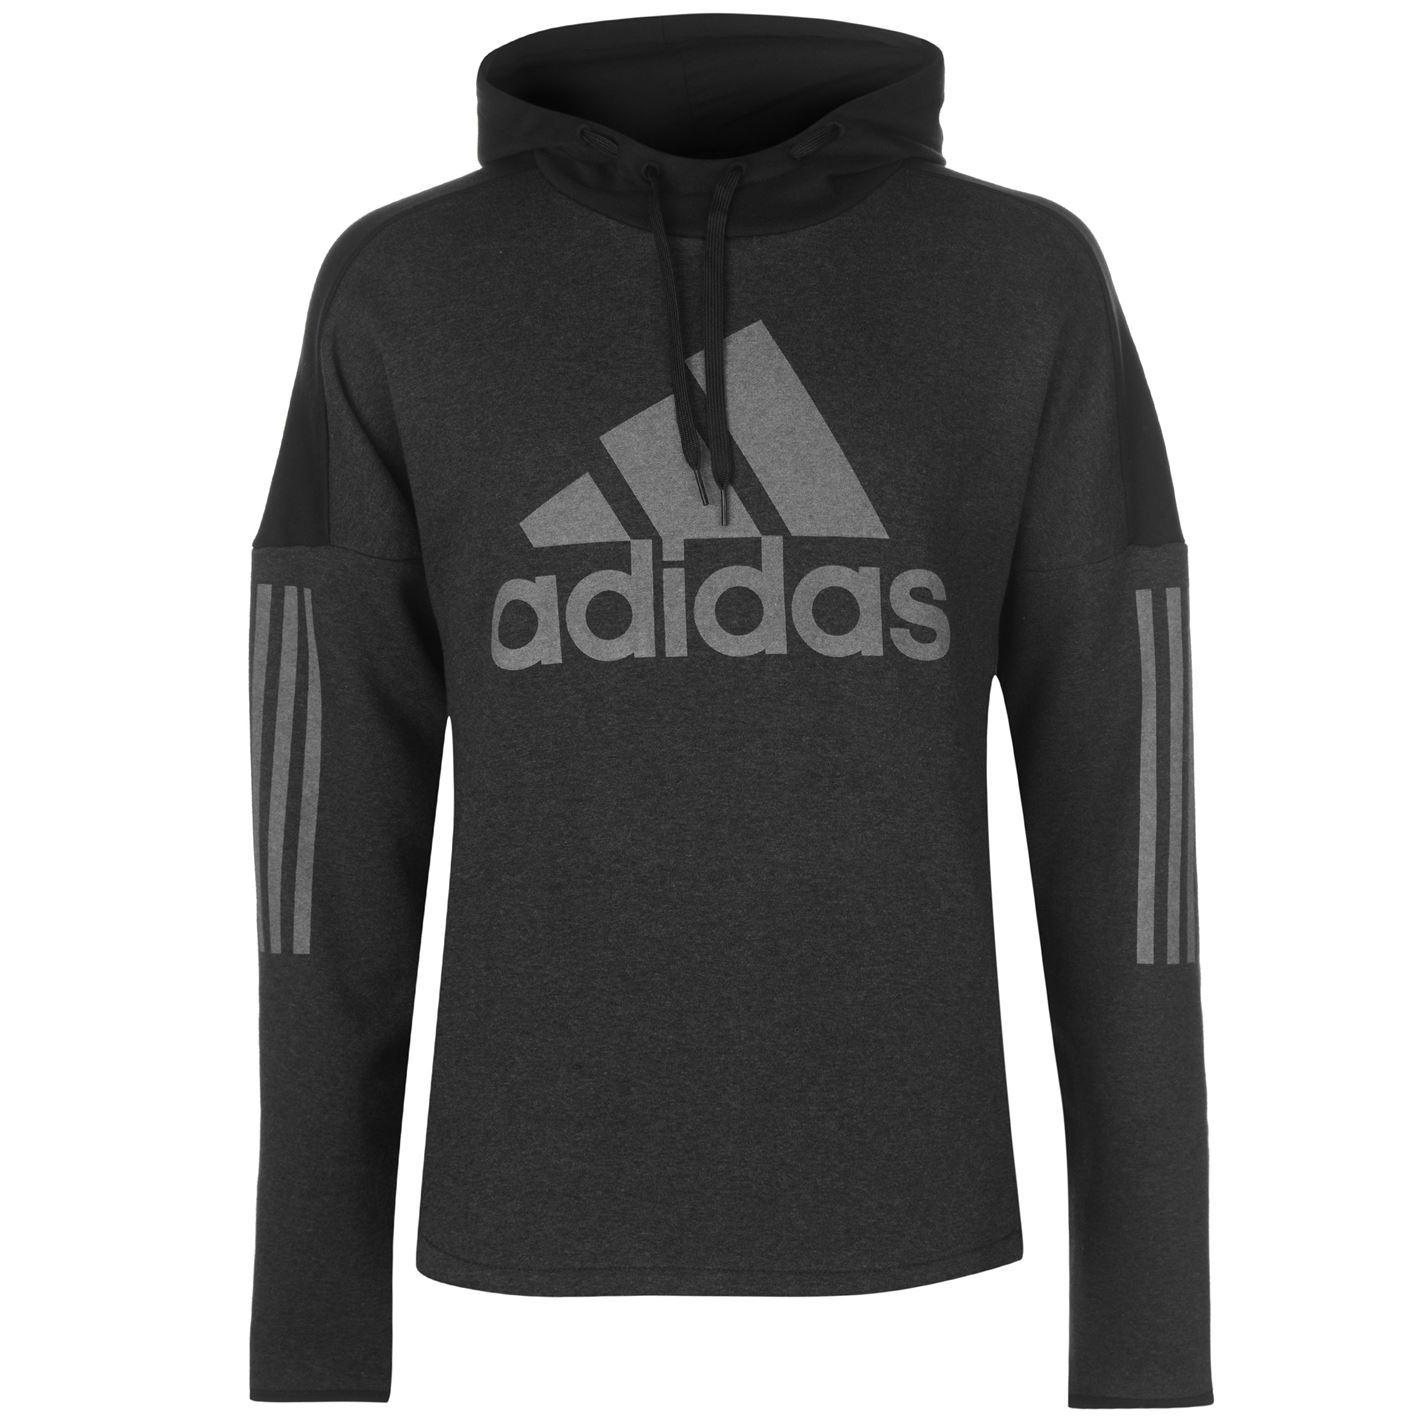 Details about adidas SID Logo Pullover Hoody Mens OTH Hoodie Sweatshirt Sweater Hooded Top